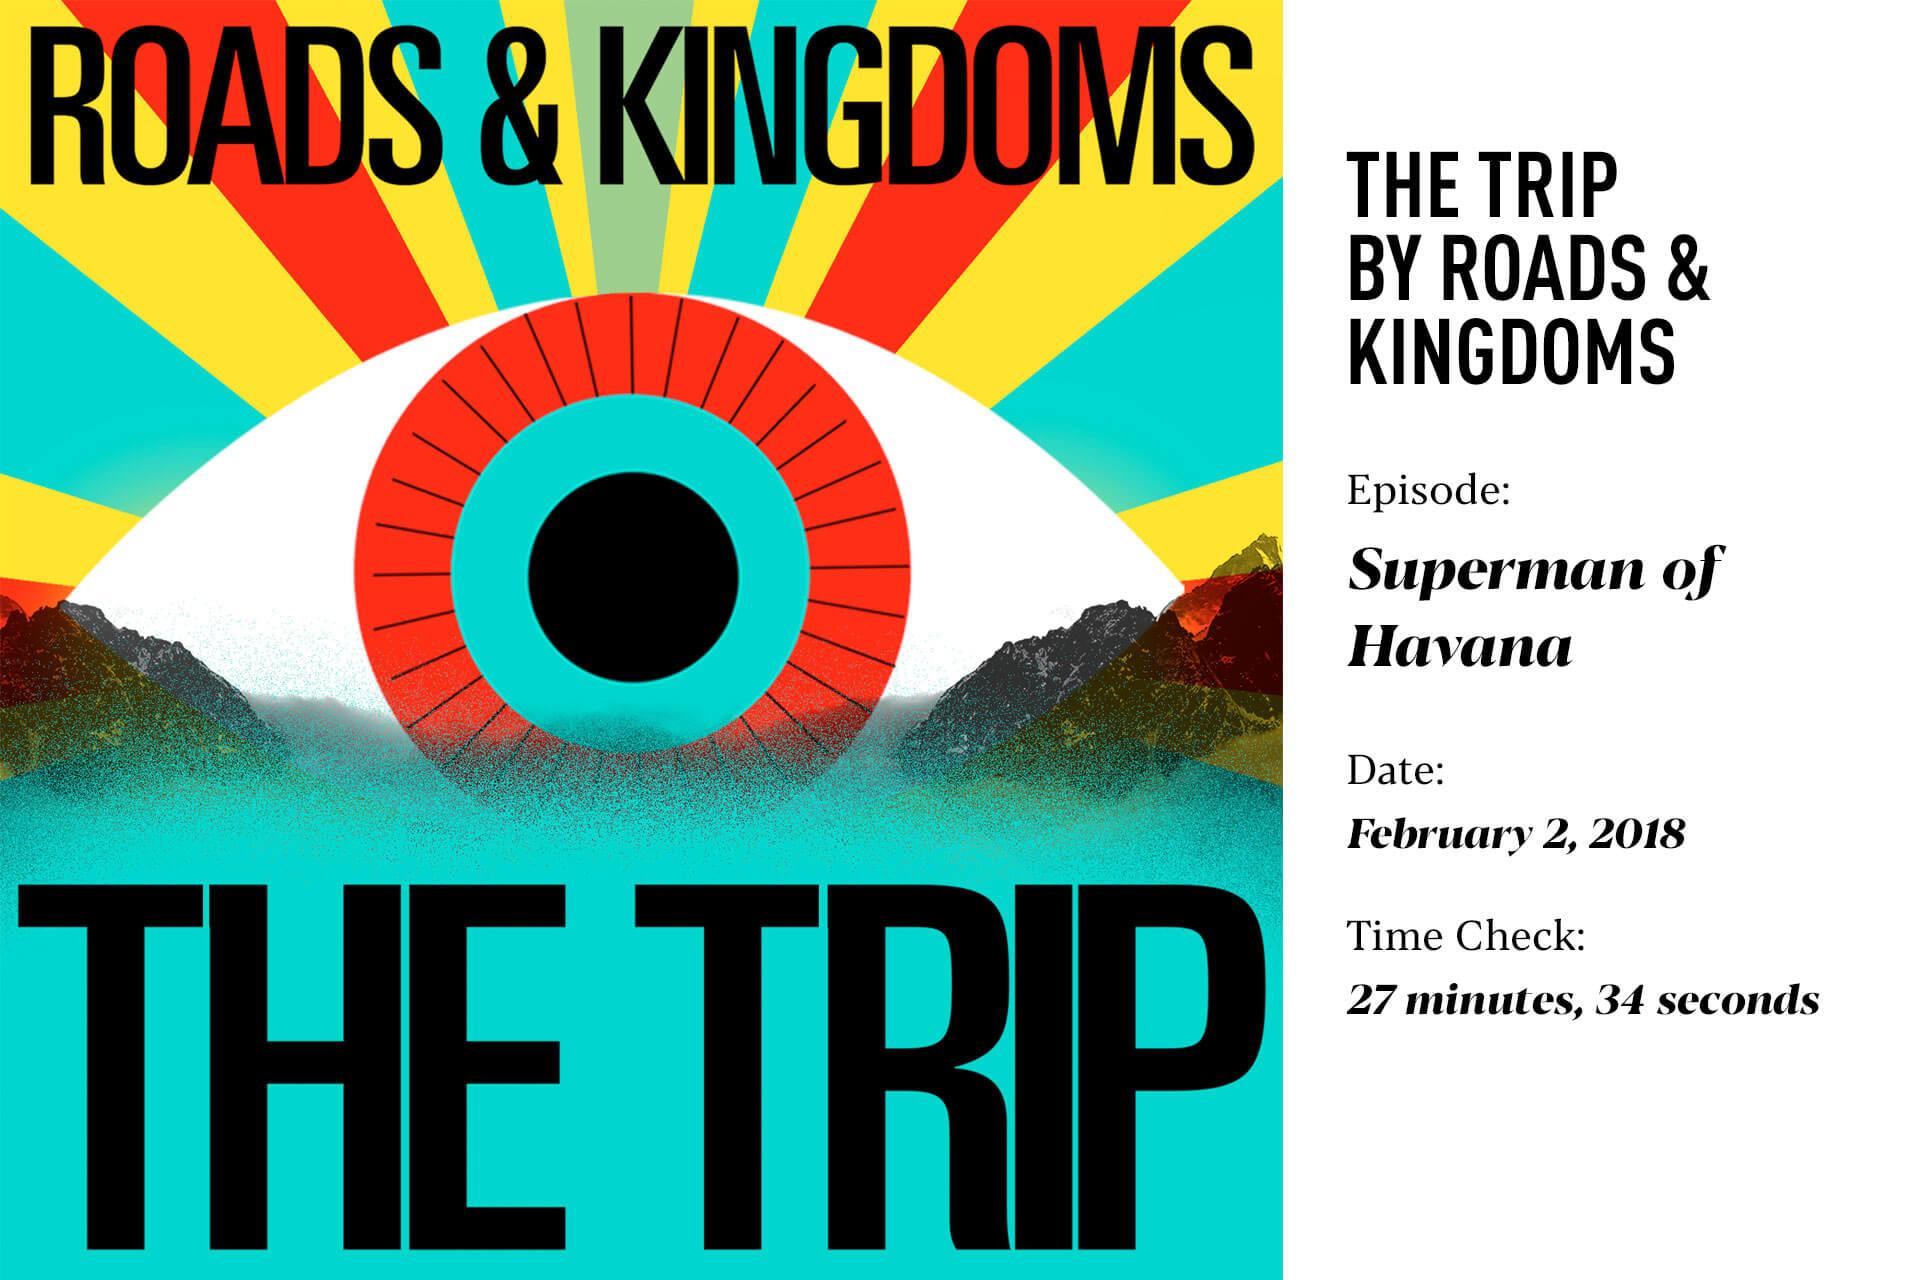 The Trip by Roads & Kingdoms